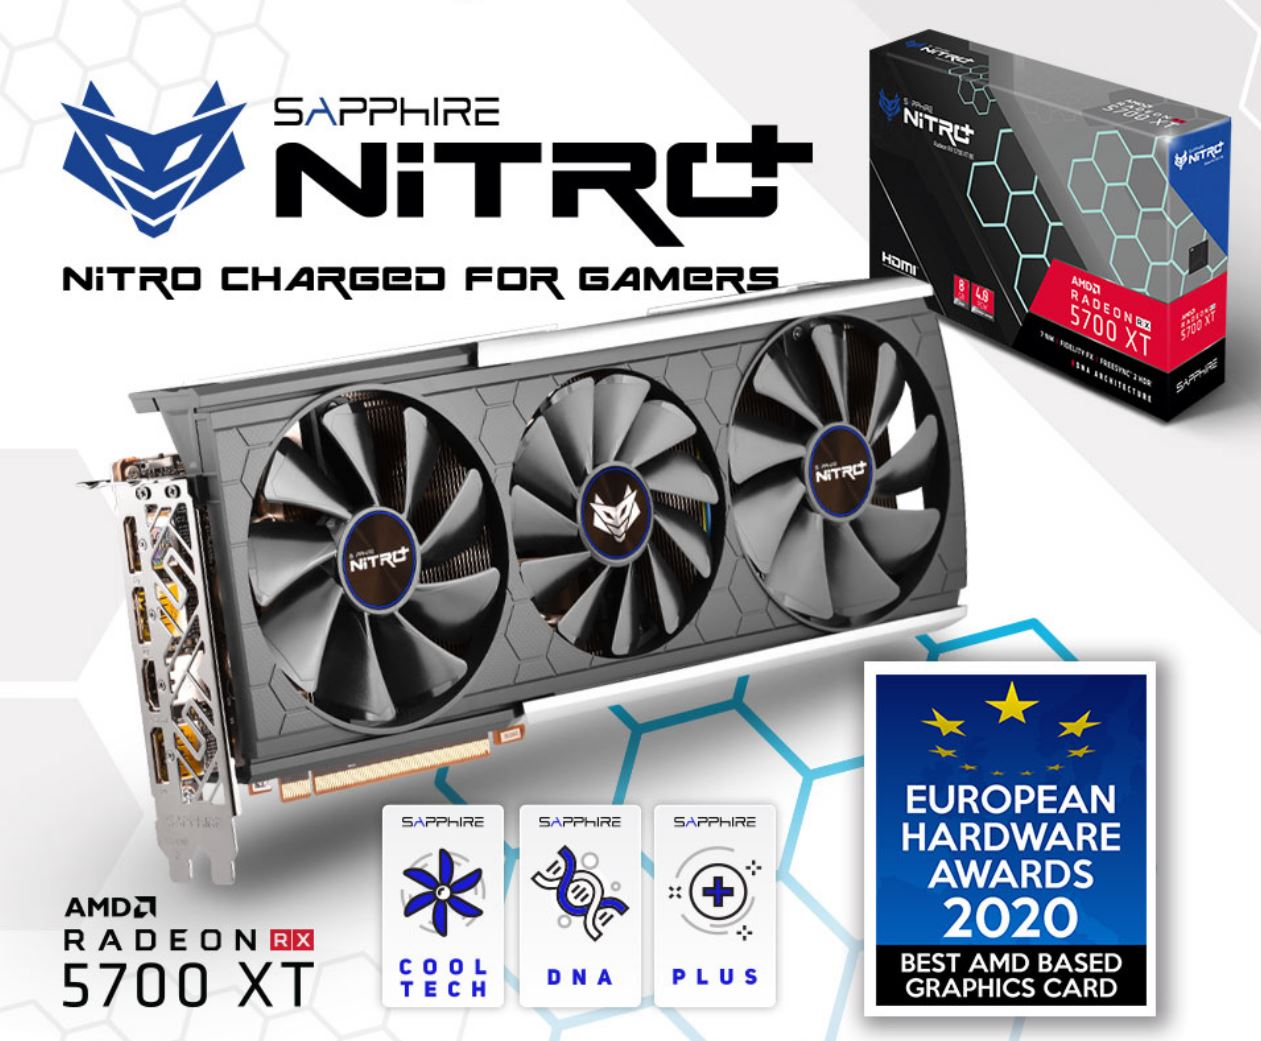 SAPPHIRE AMD RADEON NITRO+ RADEON RX 5700 XT BE 8GB GDDR6 Black Edition 1980MHz Boost 3xDP/1xHDMI PCIE 4.0